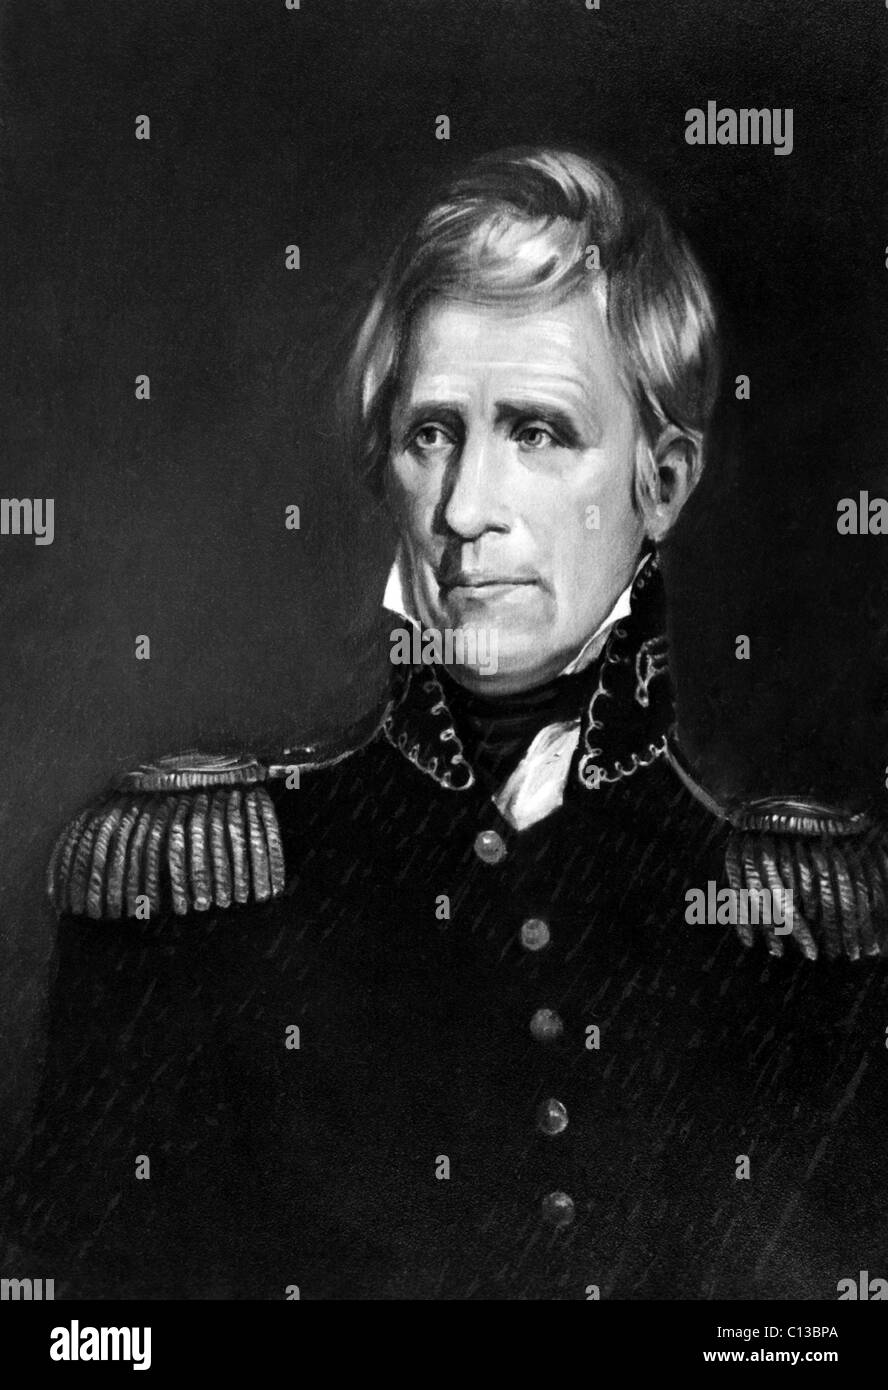 Andrew Jackson (1767-1845), U.S. President 1829-1837, circa early 1800s. - Stock Image